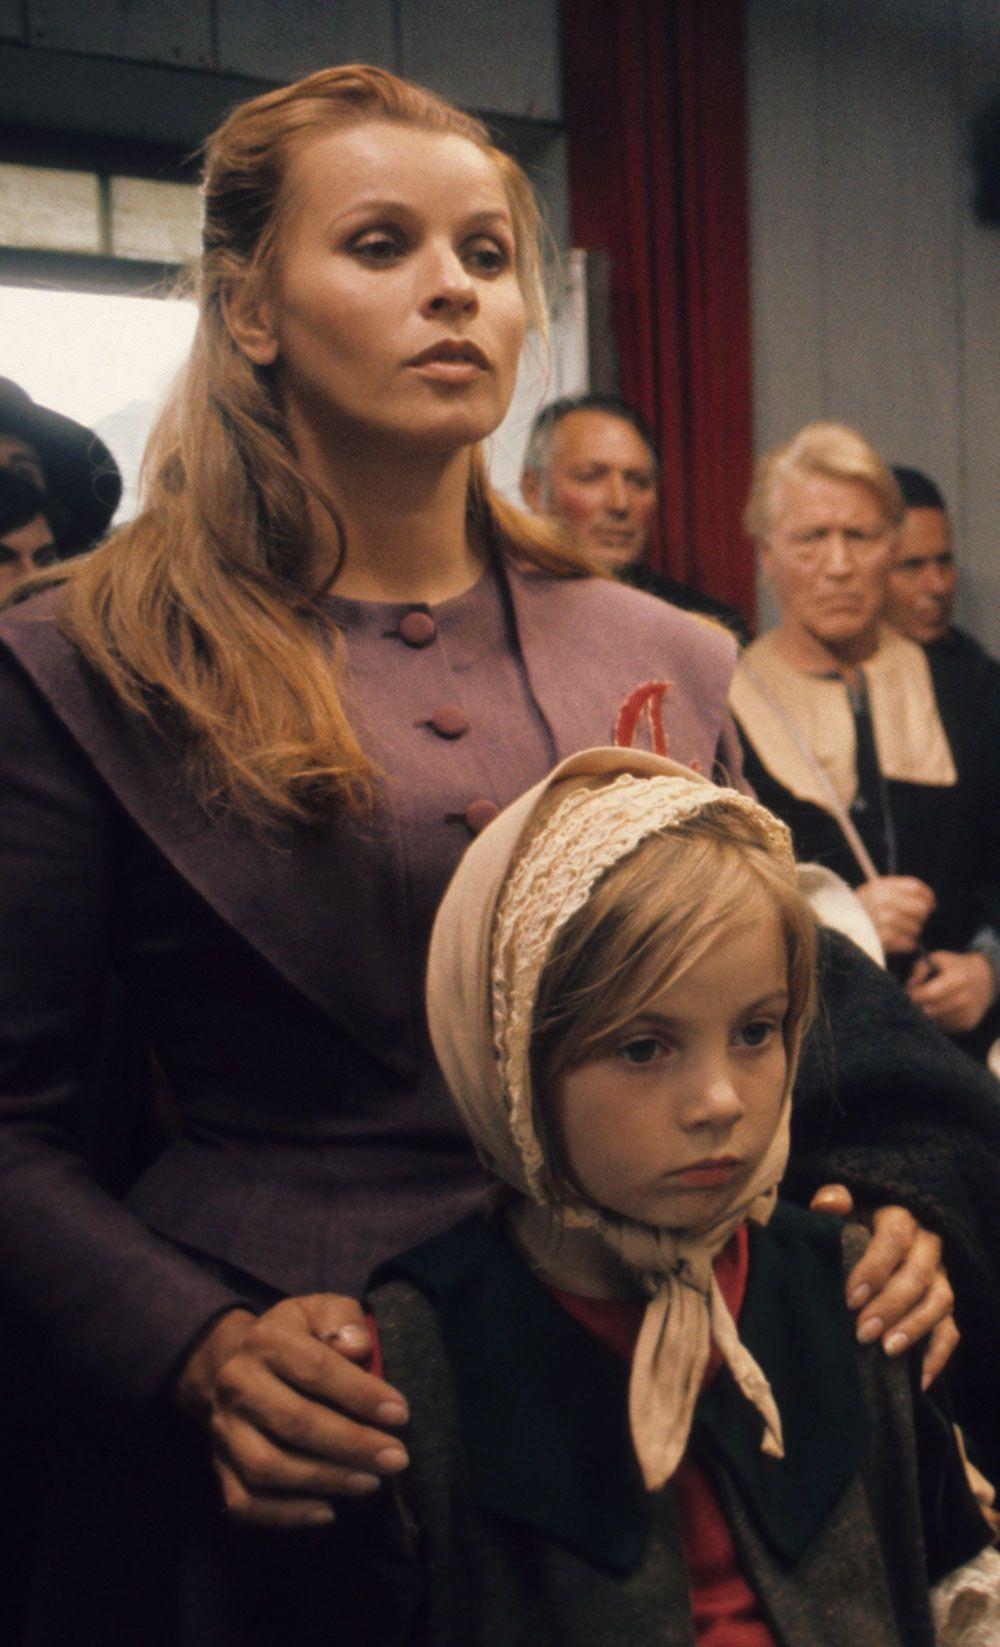 Senta Berger Portrays The Role Of Hester Prynne In The Film The Scarlet Letter To Aliko Gramma A Der Scharlachrote Buchstabe Scharlachrot Scharlach